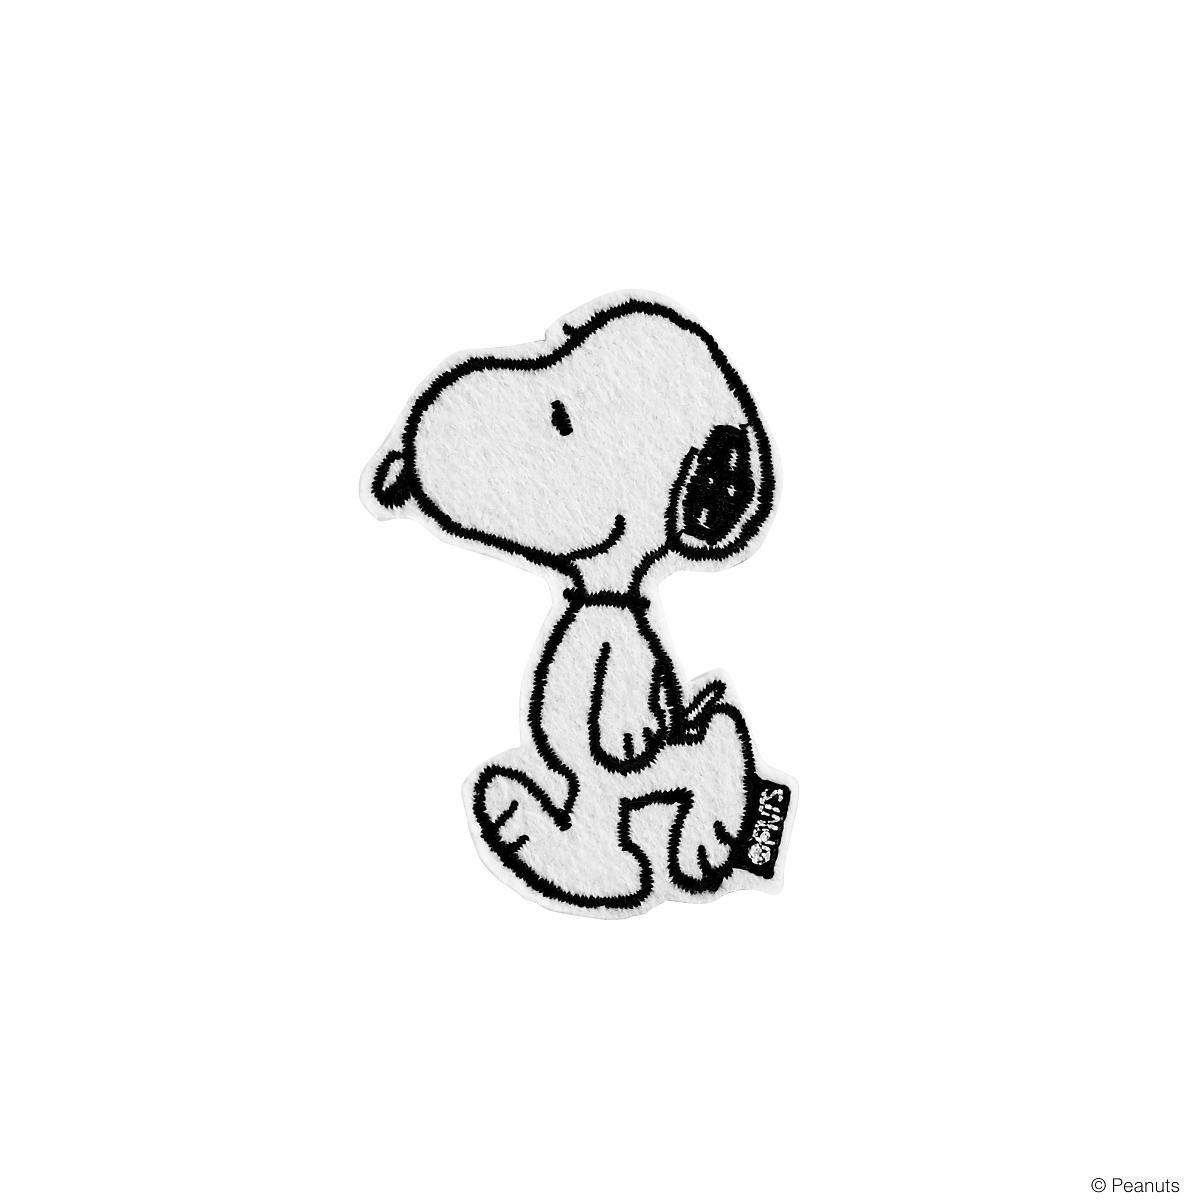 BUTLERS PEANUTS »Snoopy selbstklebend«